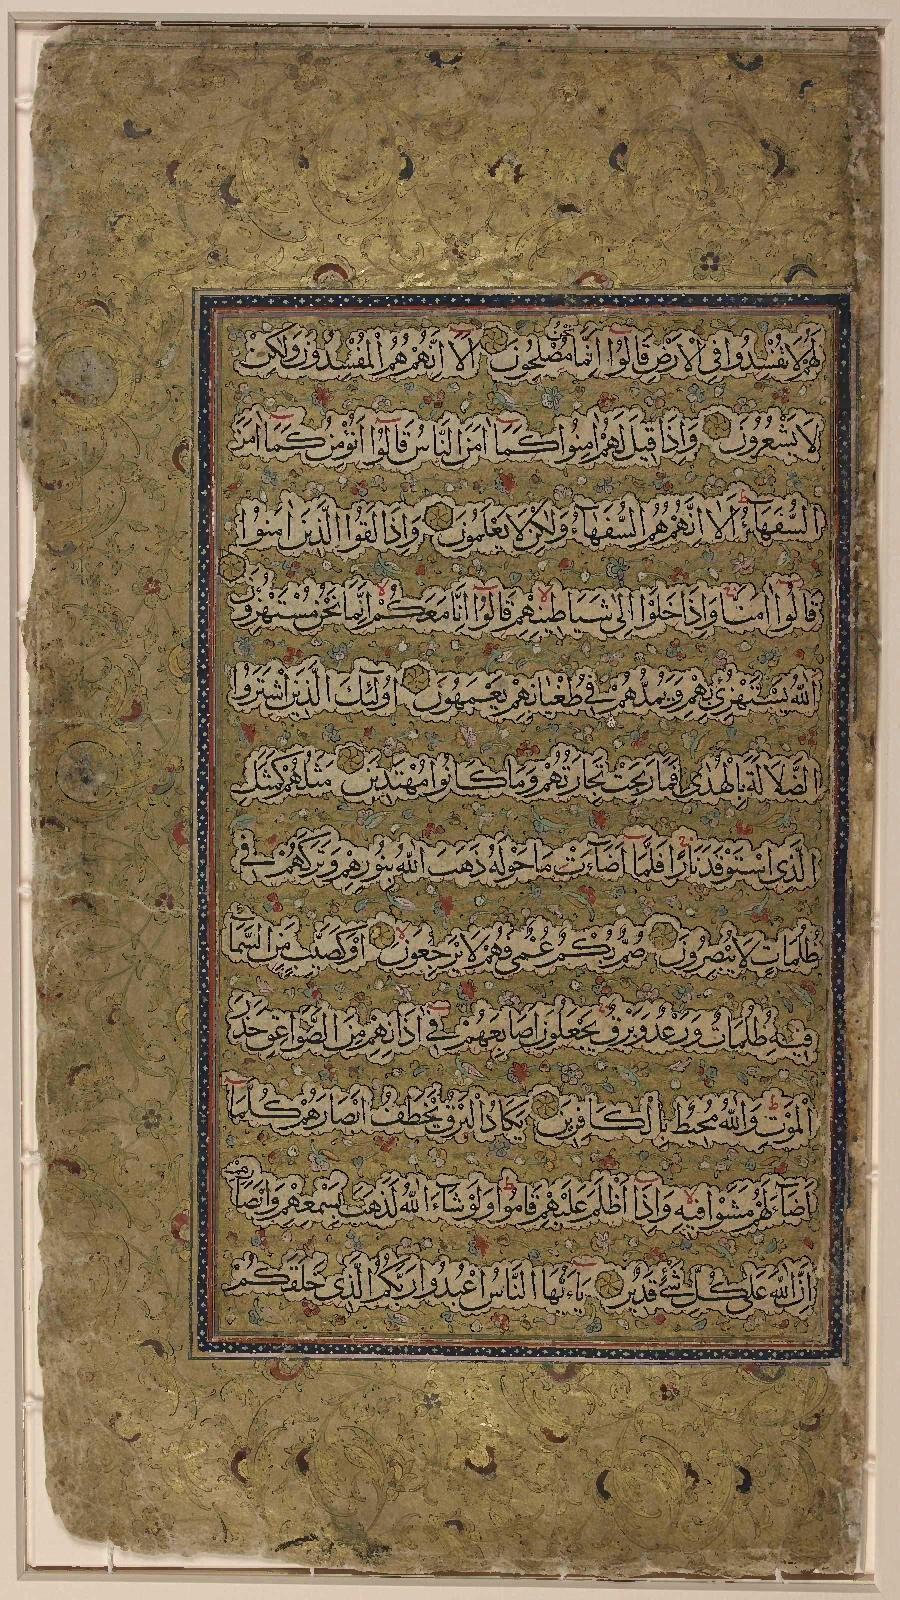 File:Safavid Qur\'an (2-11-27) WDL6792.pdf - Wikimedia Commons